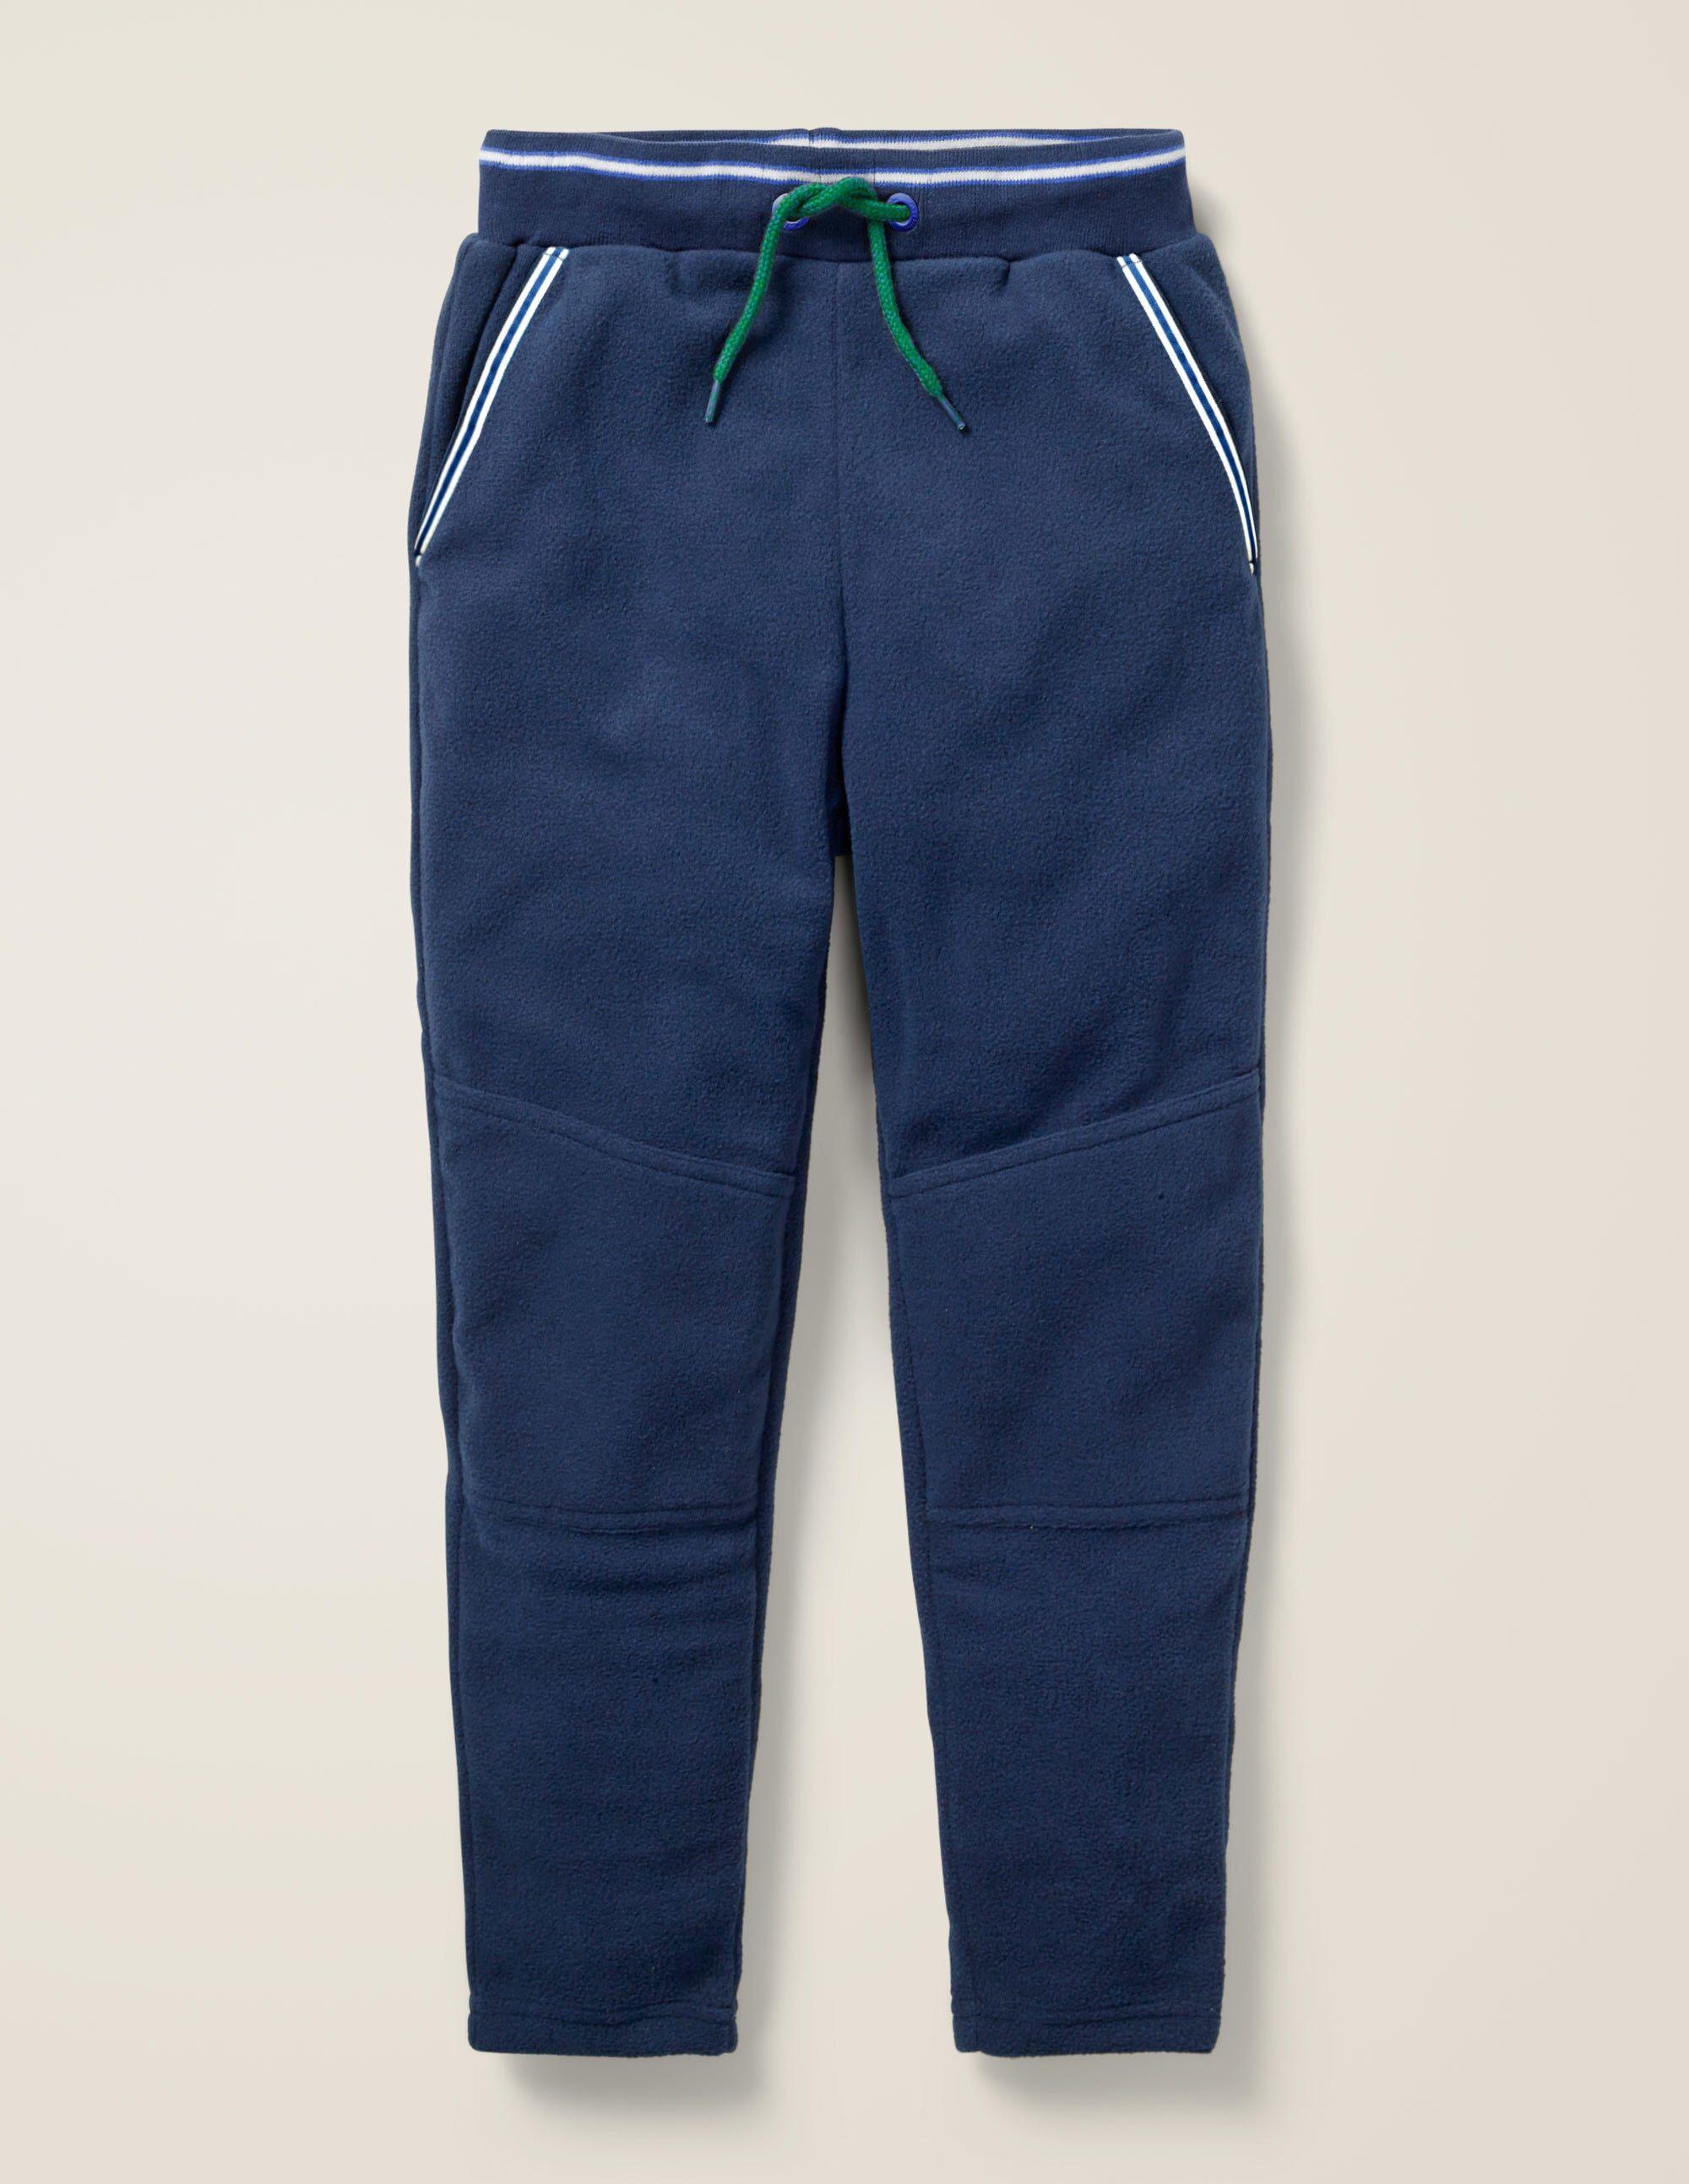 Mini Pantalon de survêtement en micro-polaire BLU Garçon Boden, Blue - 8a